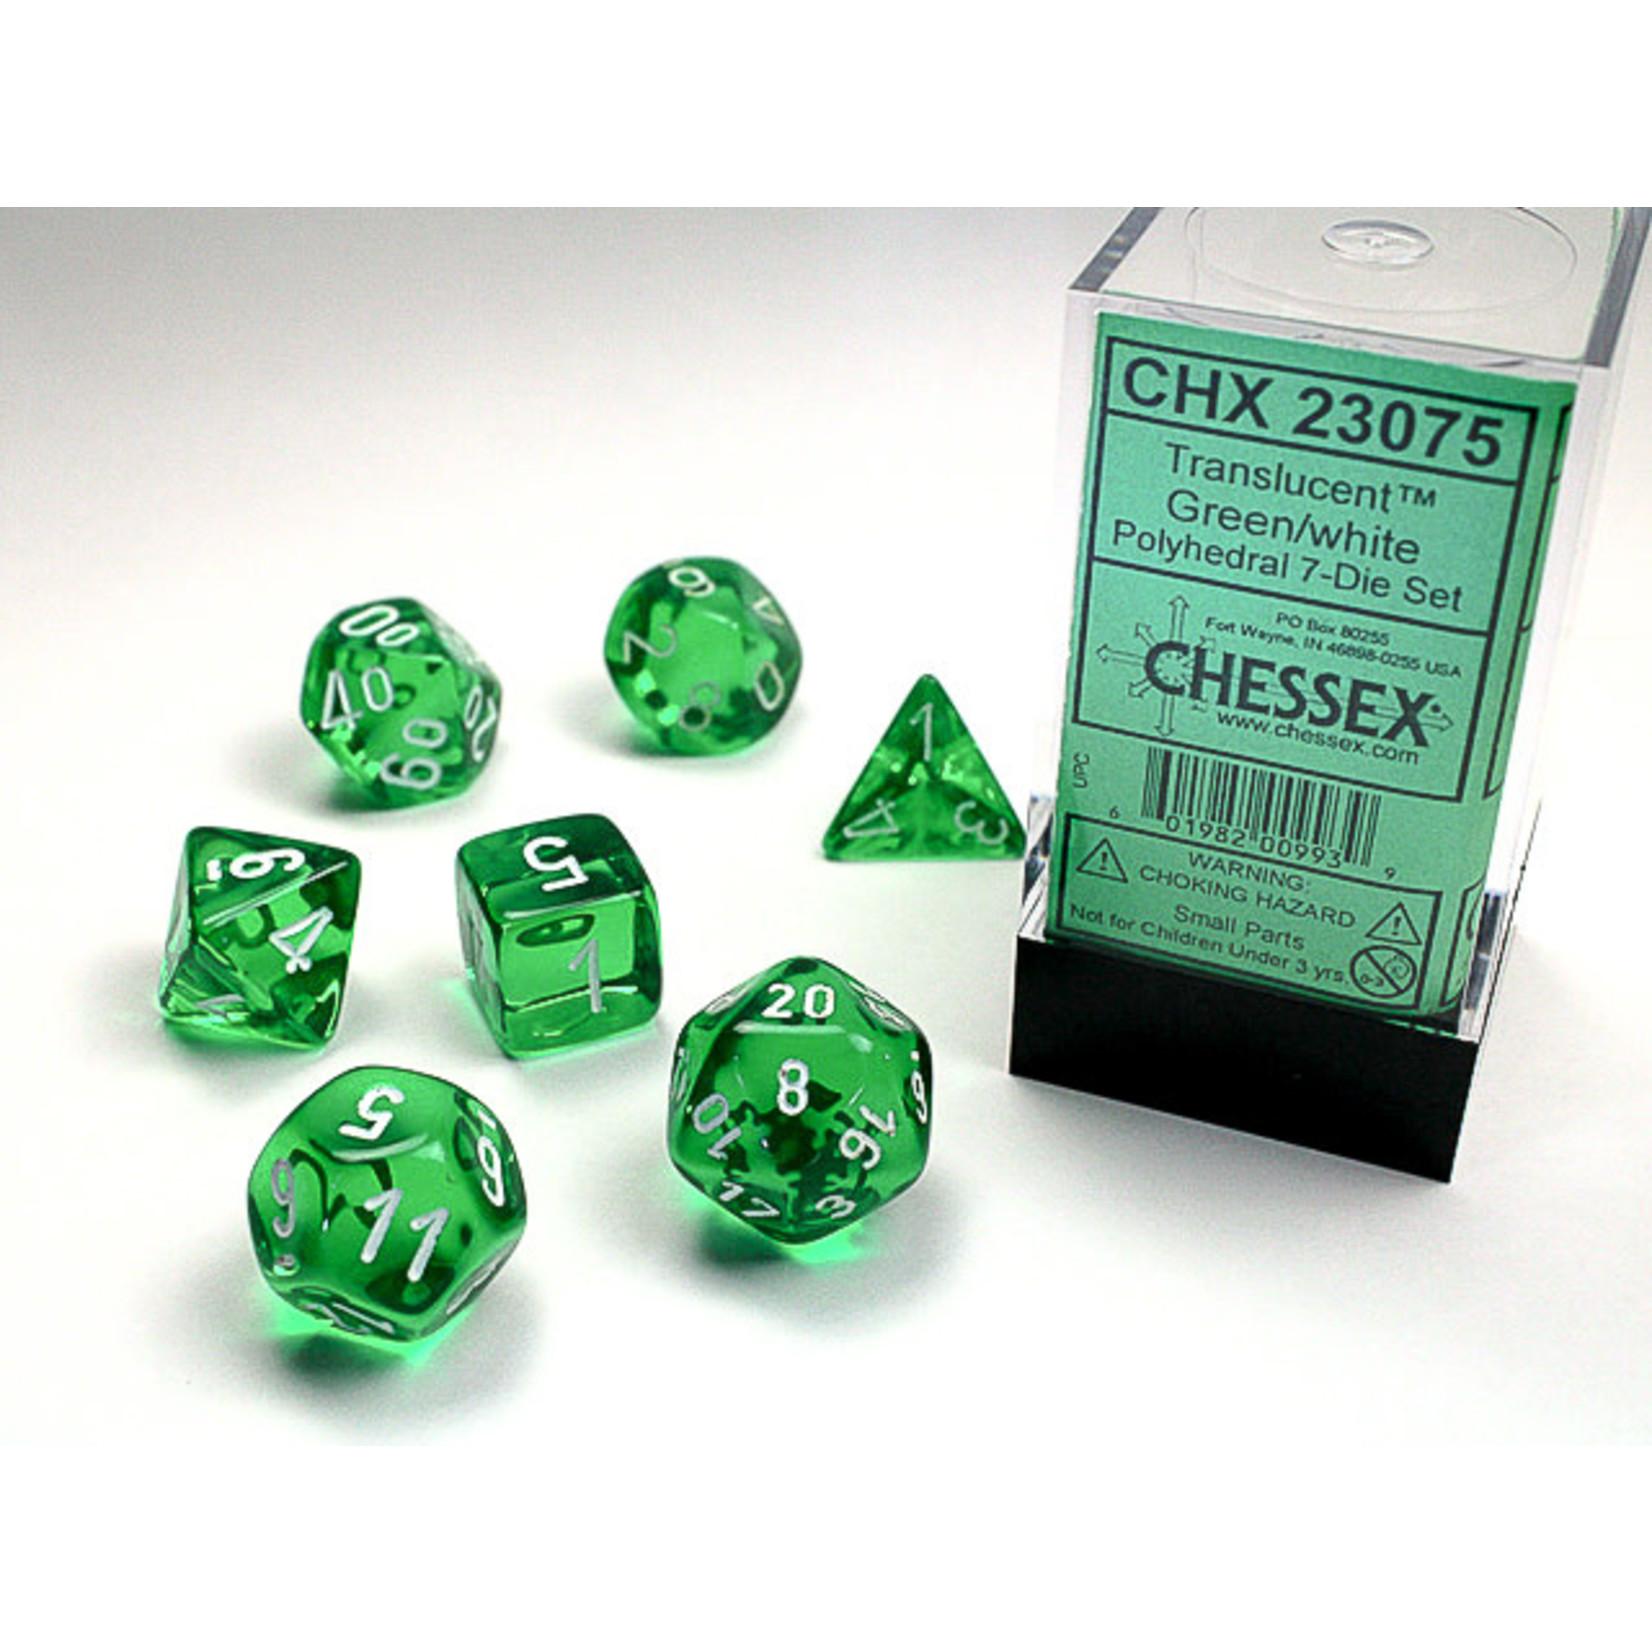 Chessex Chessex 7-Set Dice: Translucent Green/White 23075